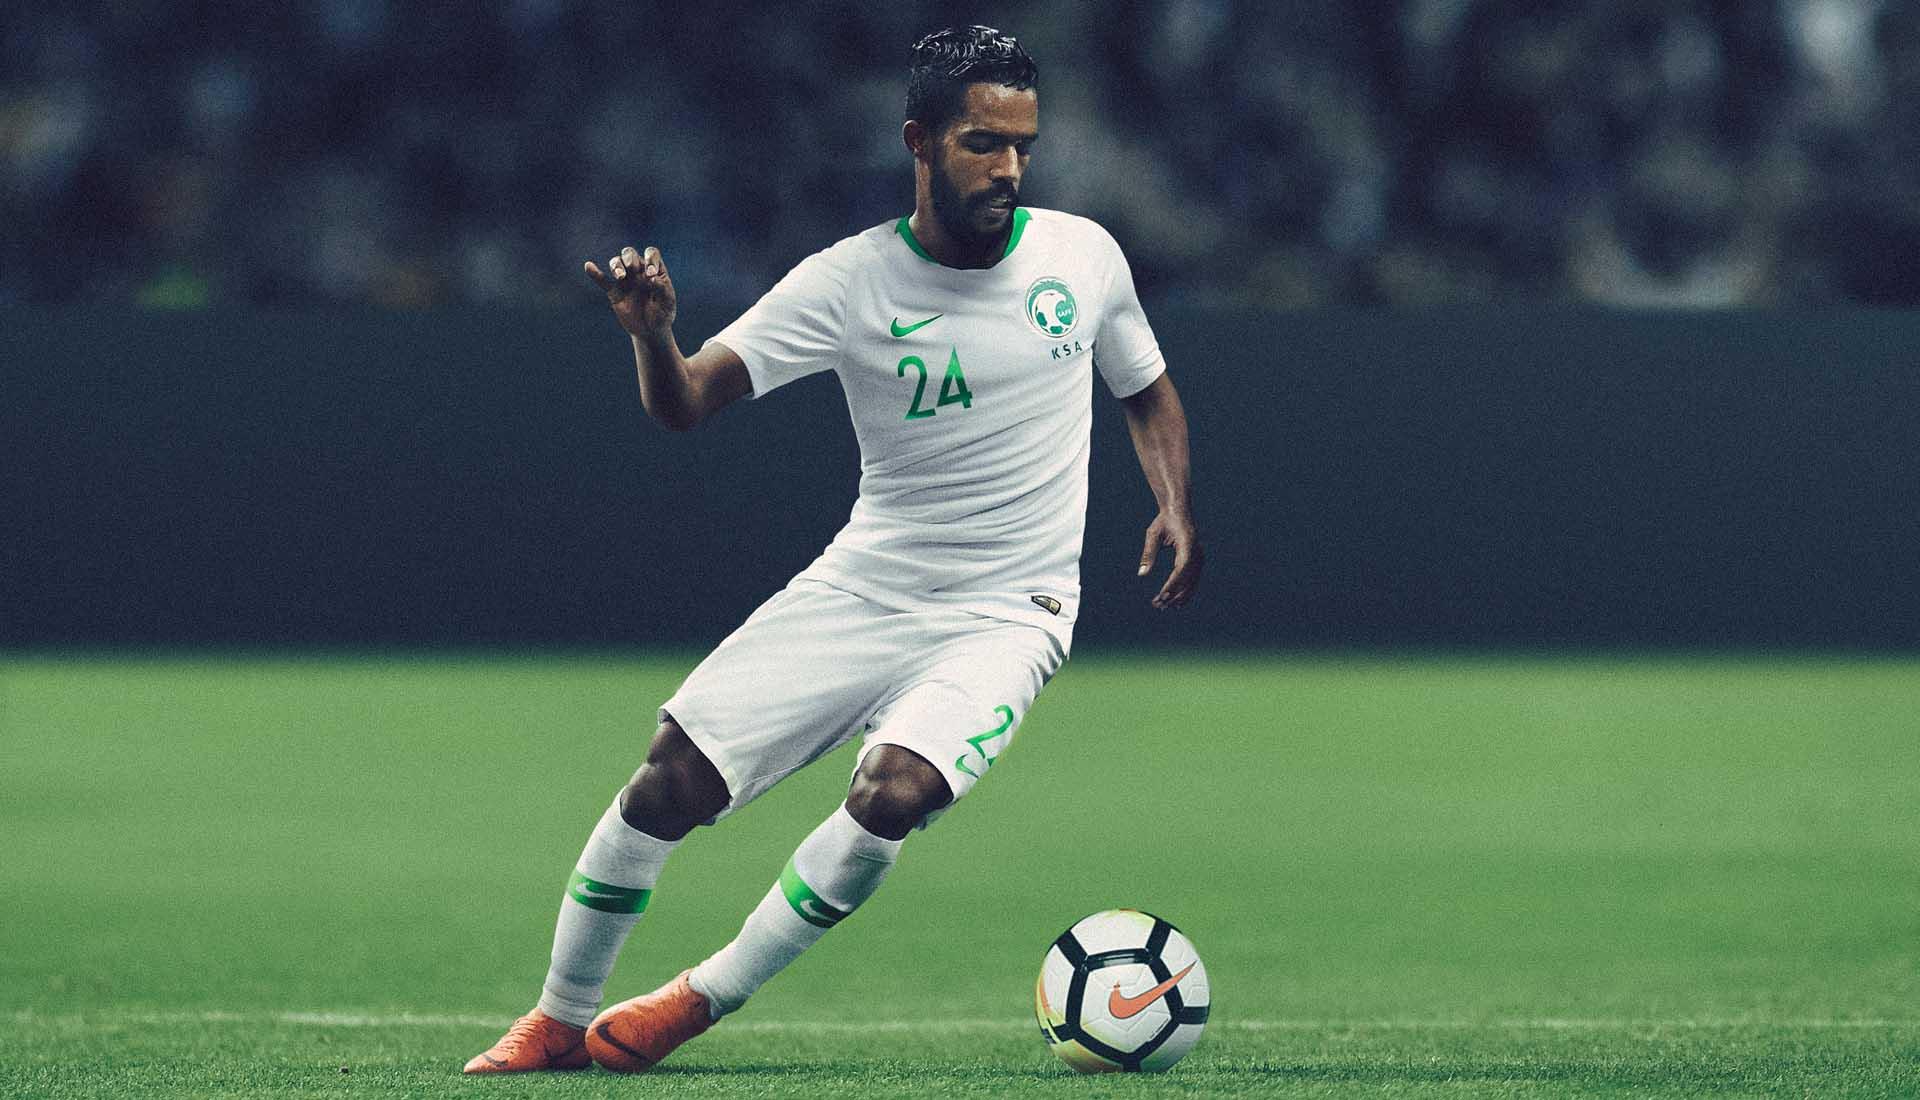 big sale 1fc17 529ba Nike Launch Saudi Arabia 2018 World Cup Kits - SoccerBible